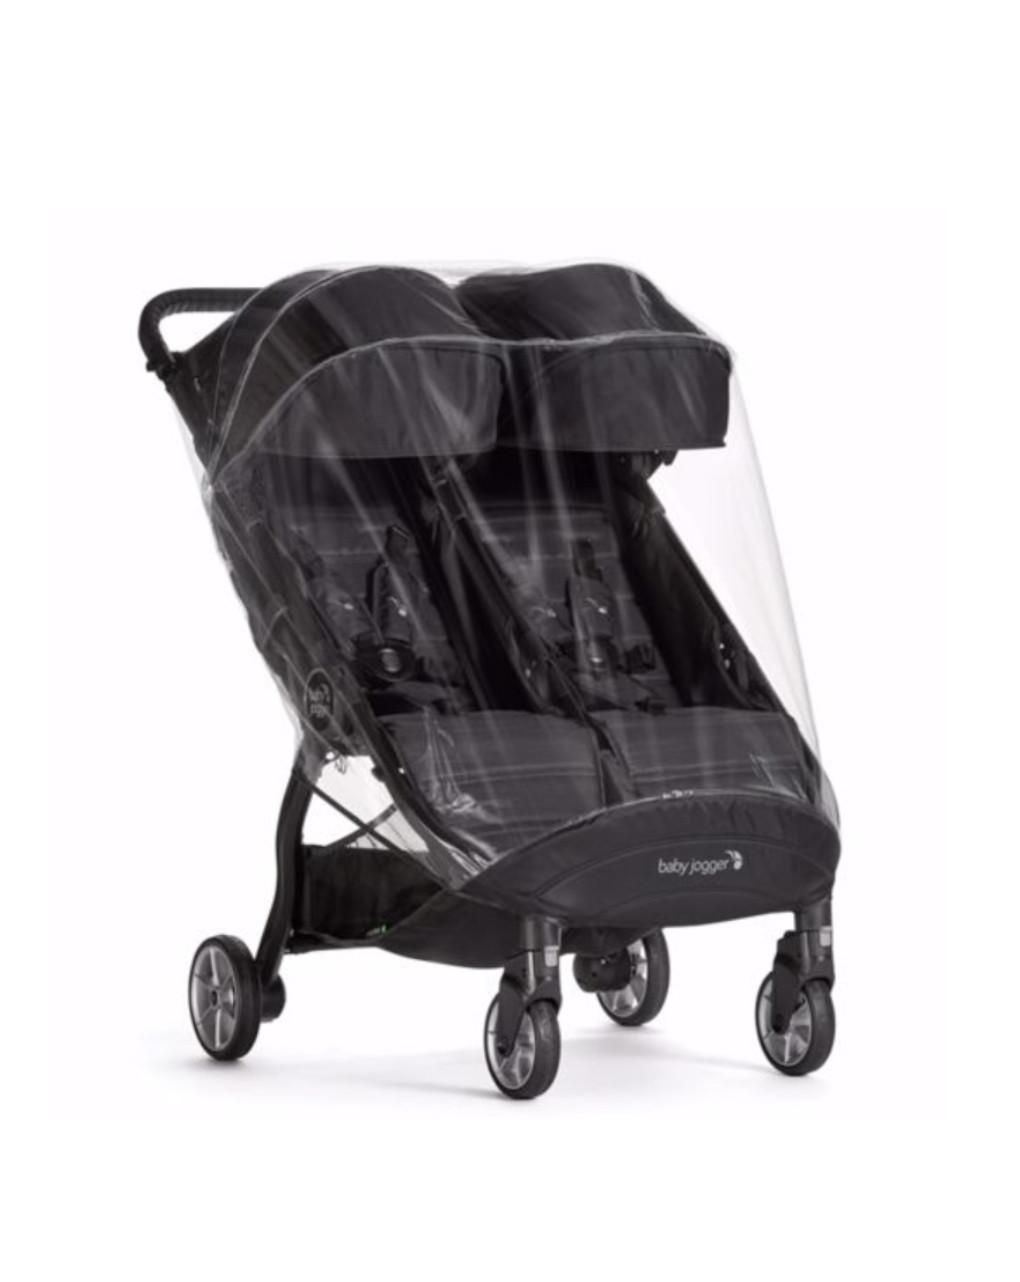 Parapioggia city tour2 double - Baby Jogger